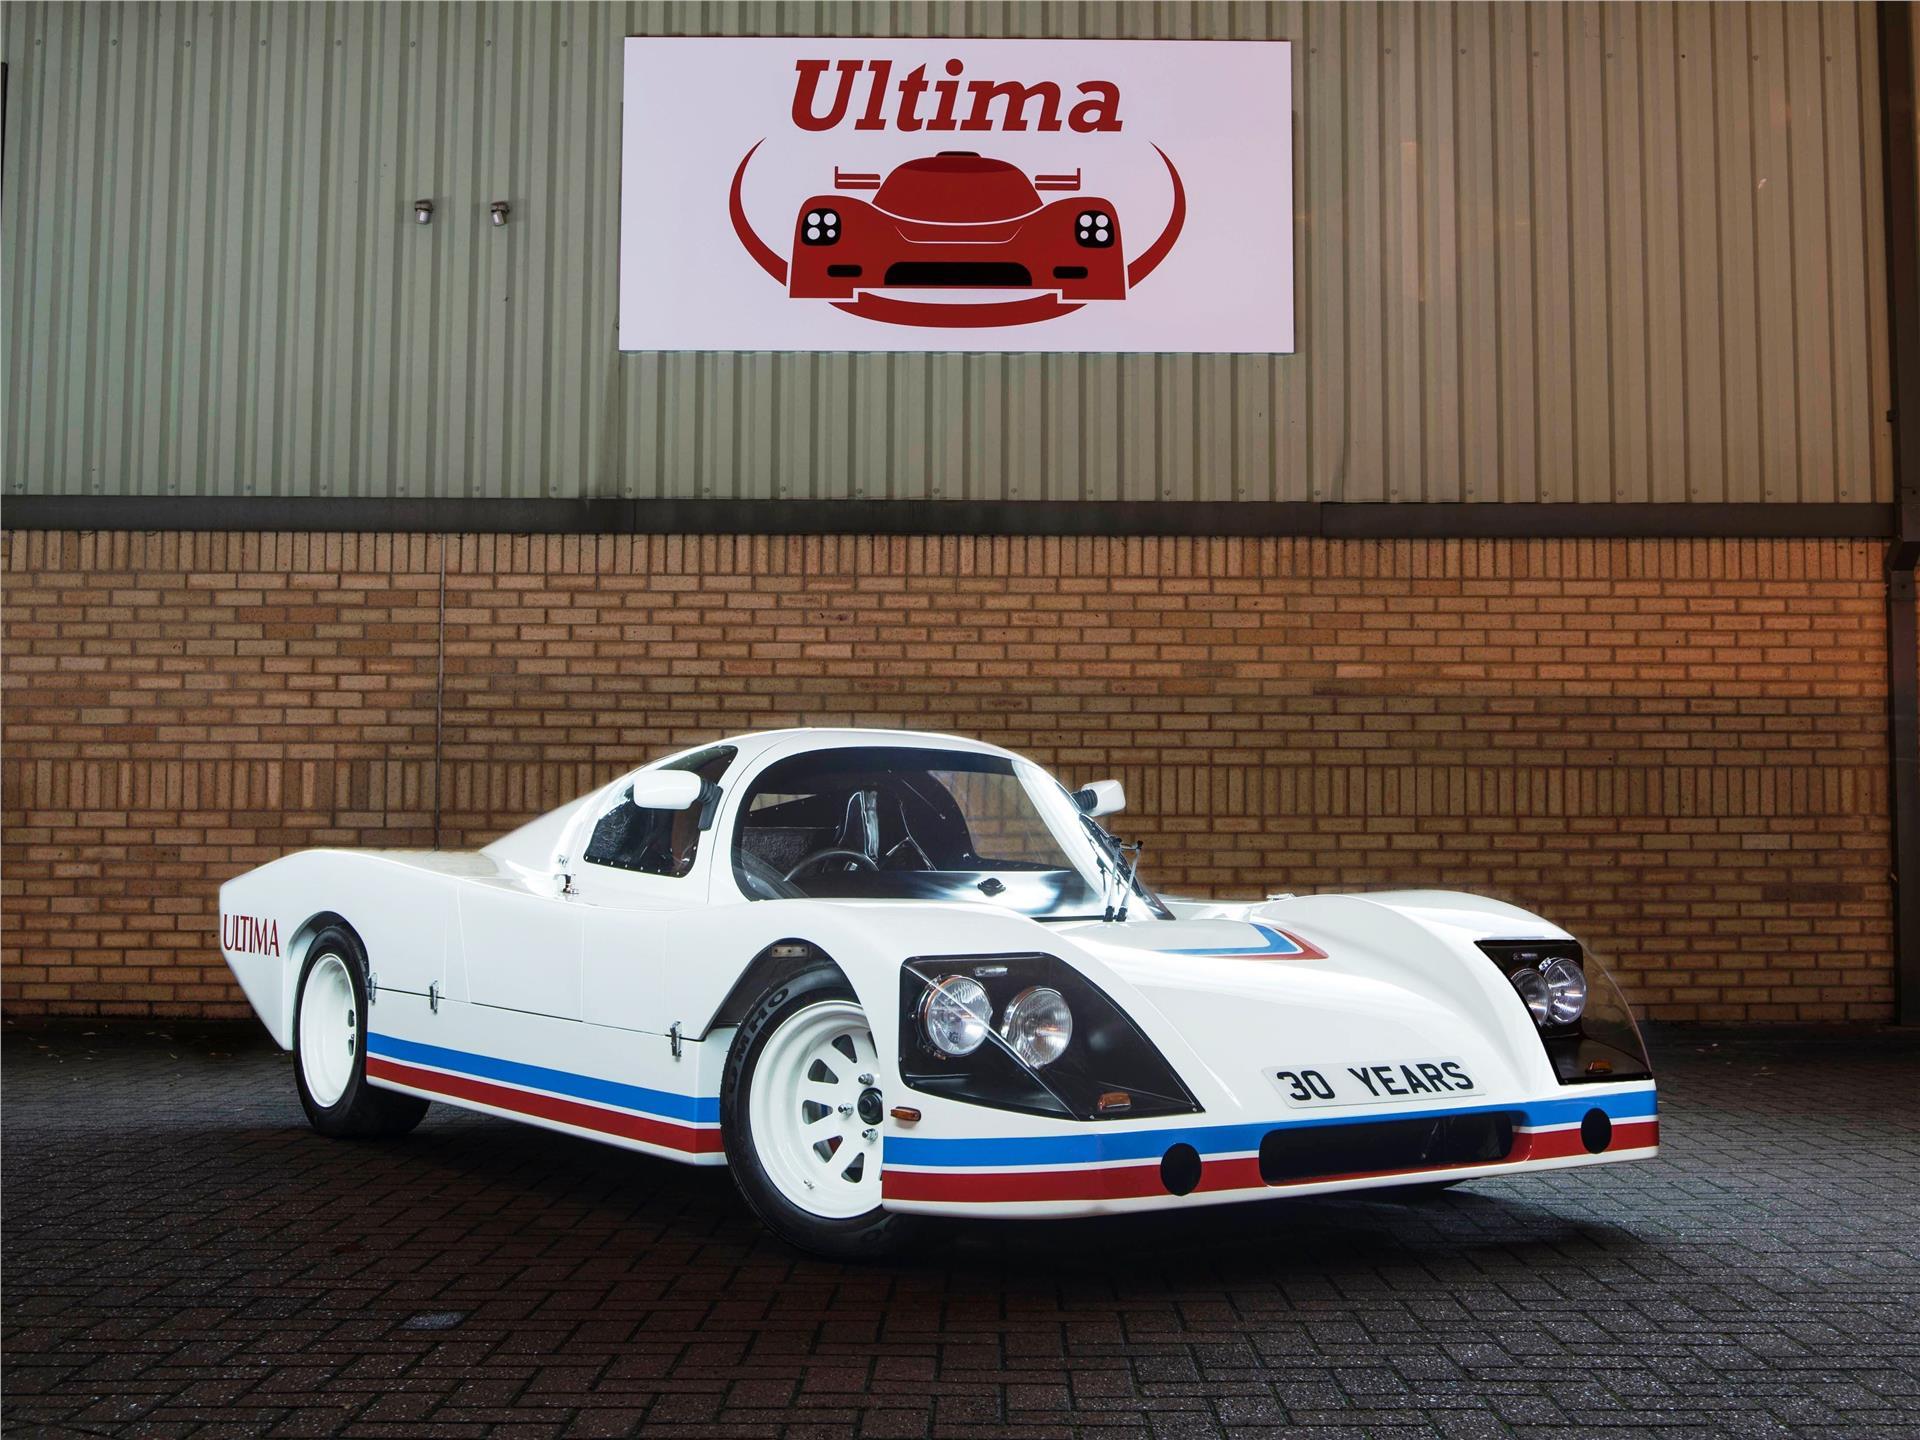 1983 to 1991